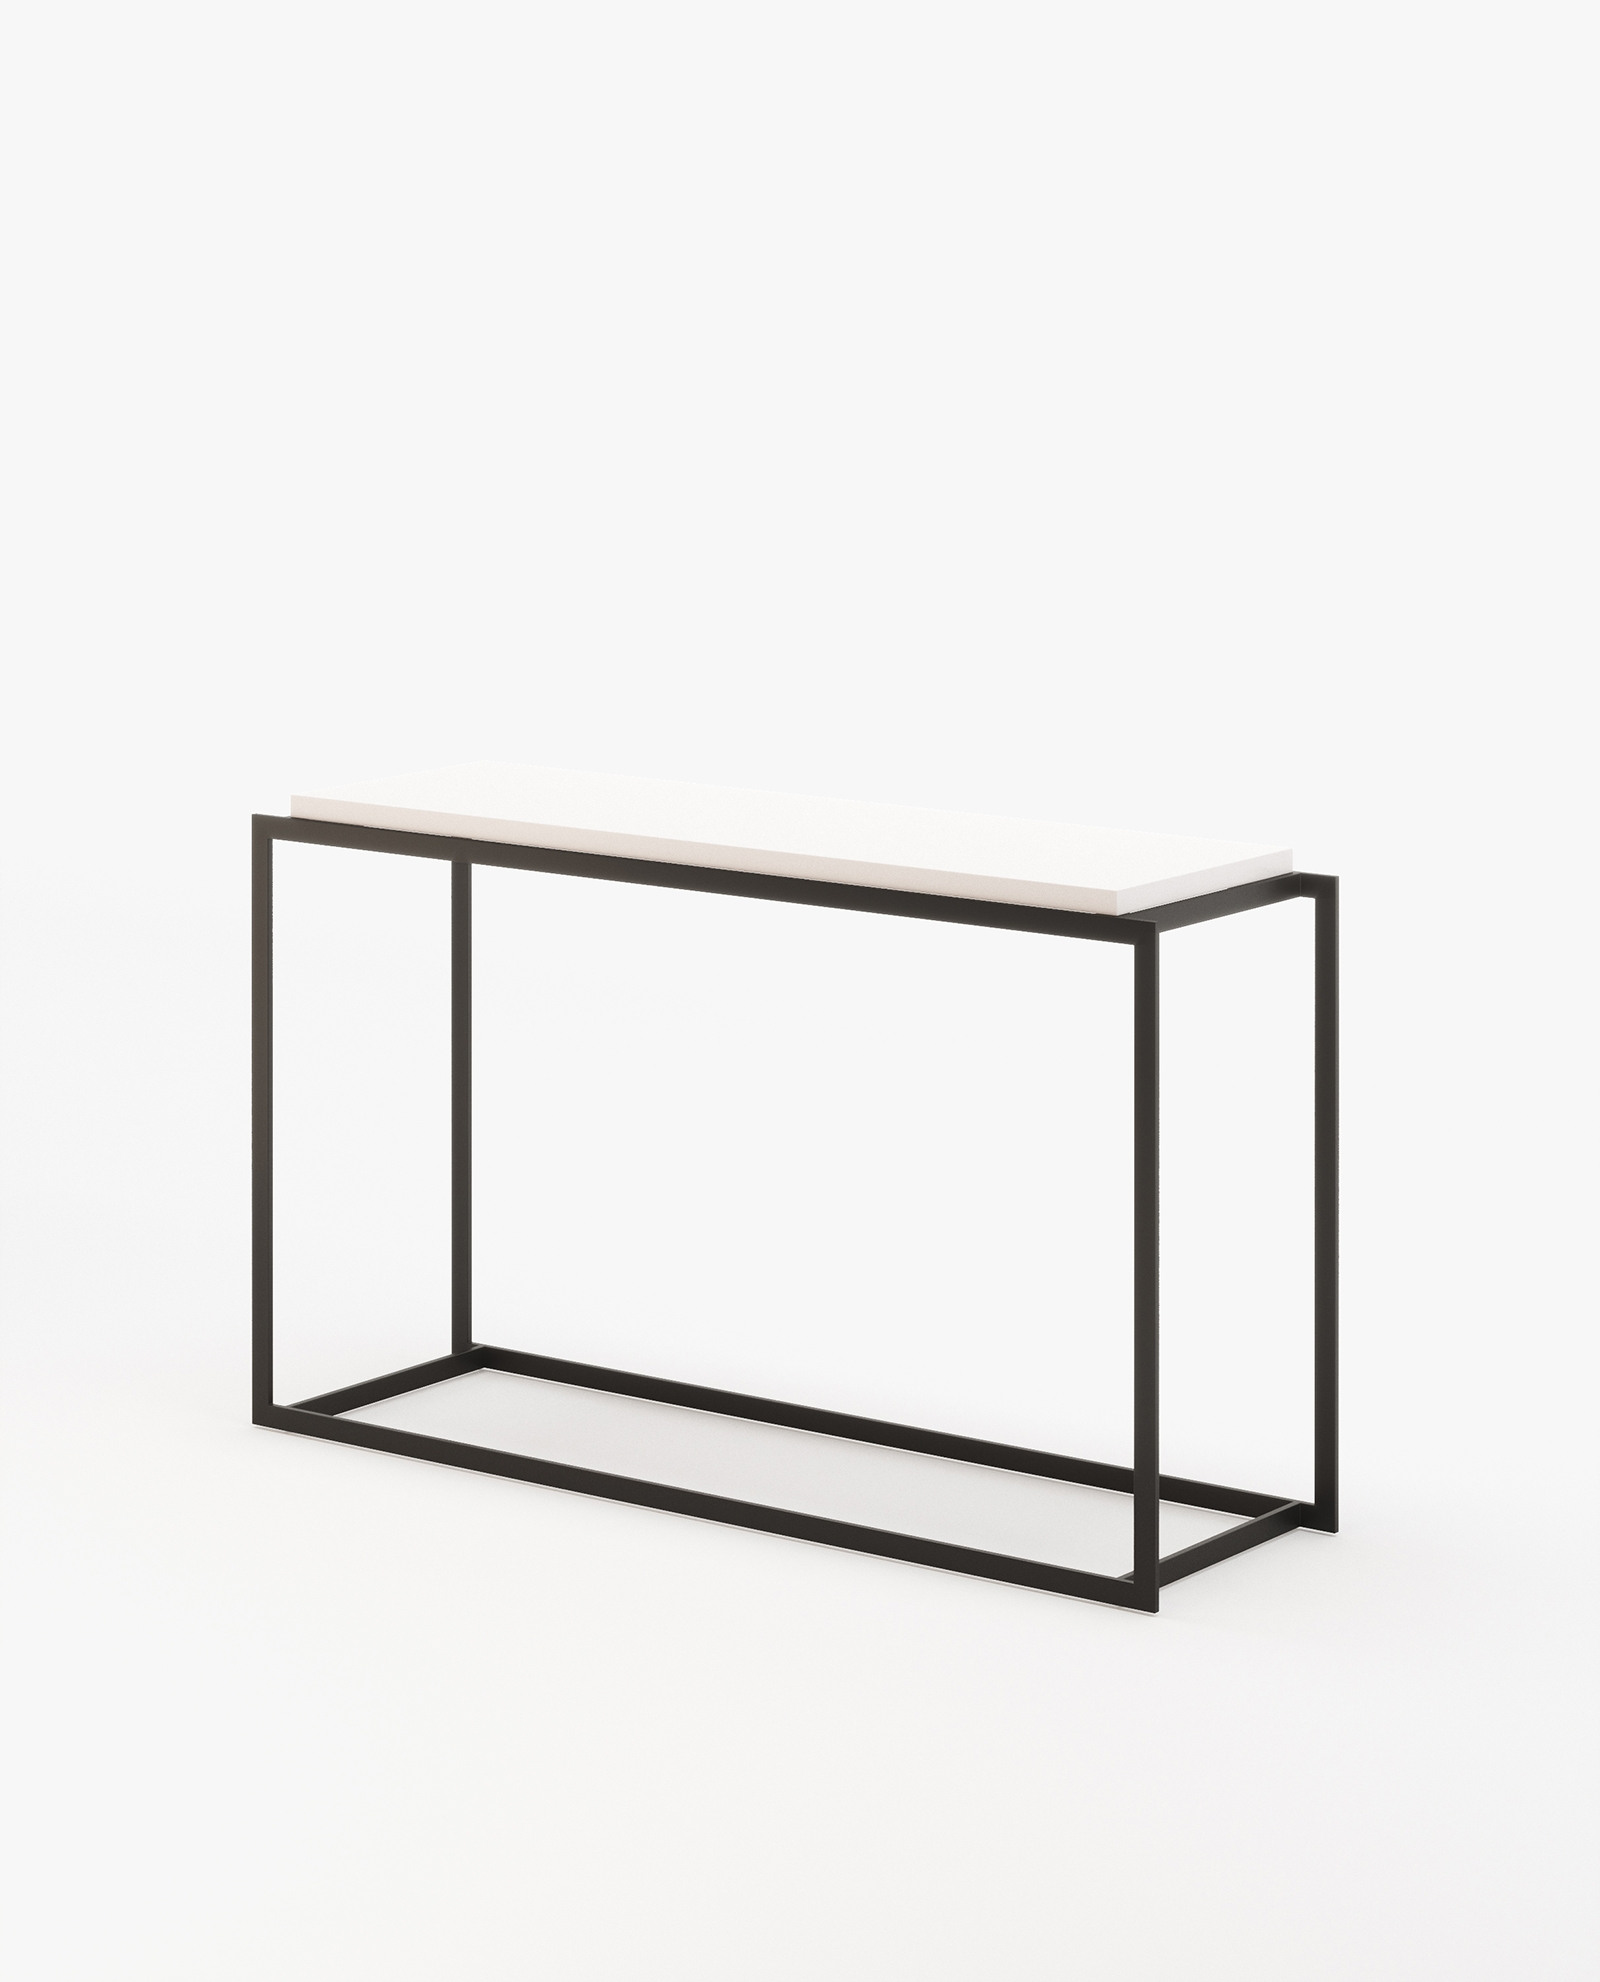 consola-lacado-branco-ferro-preto (1)